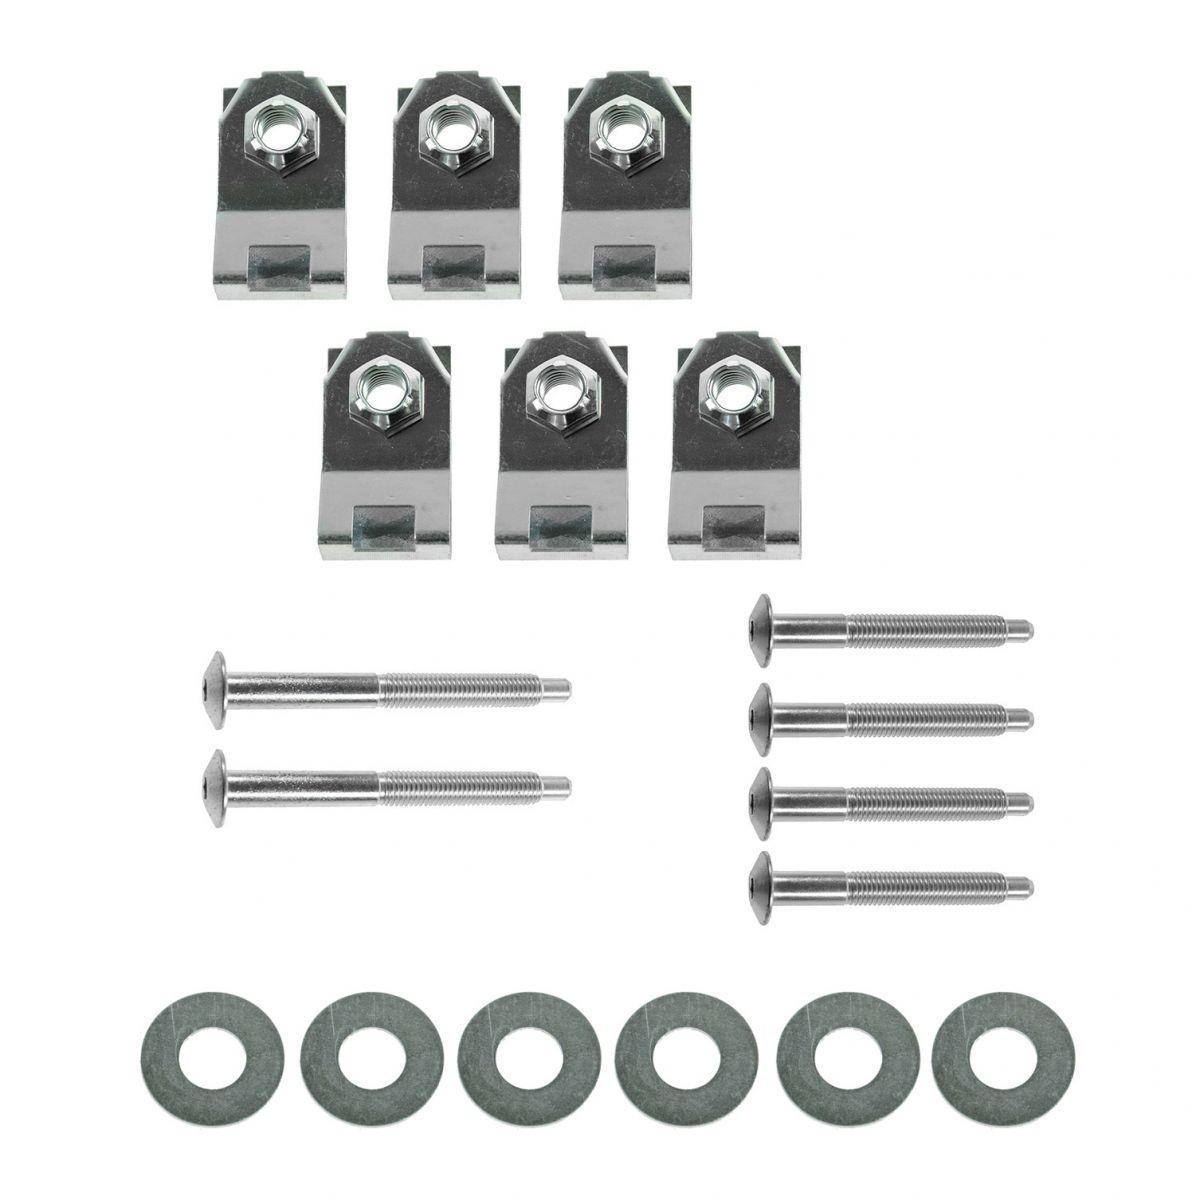 Threaded rivets bolts washers M4 kit for Fender Flares Installation Tekit6 12pcs